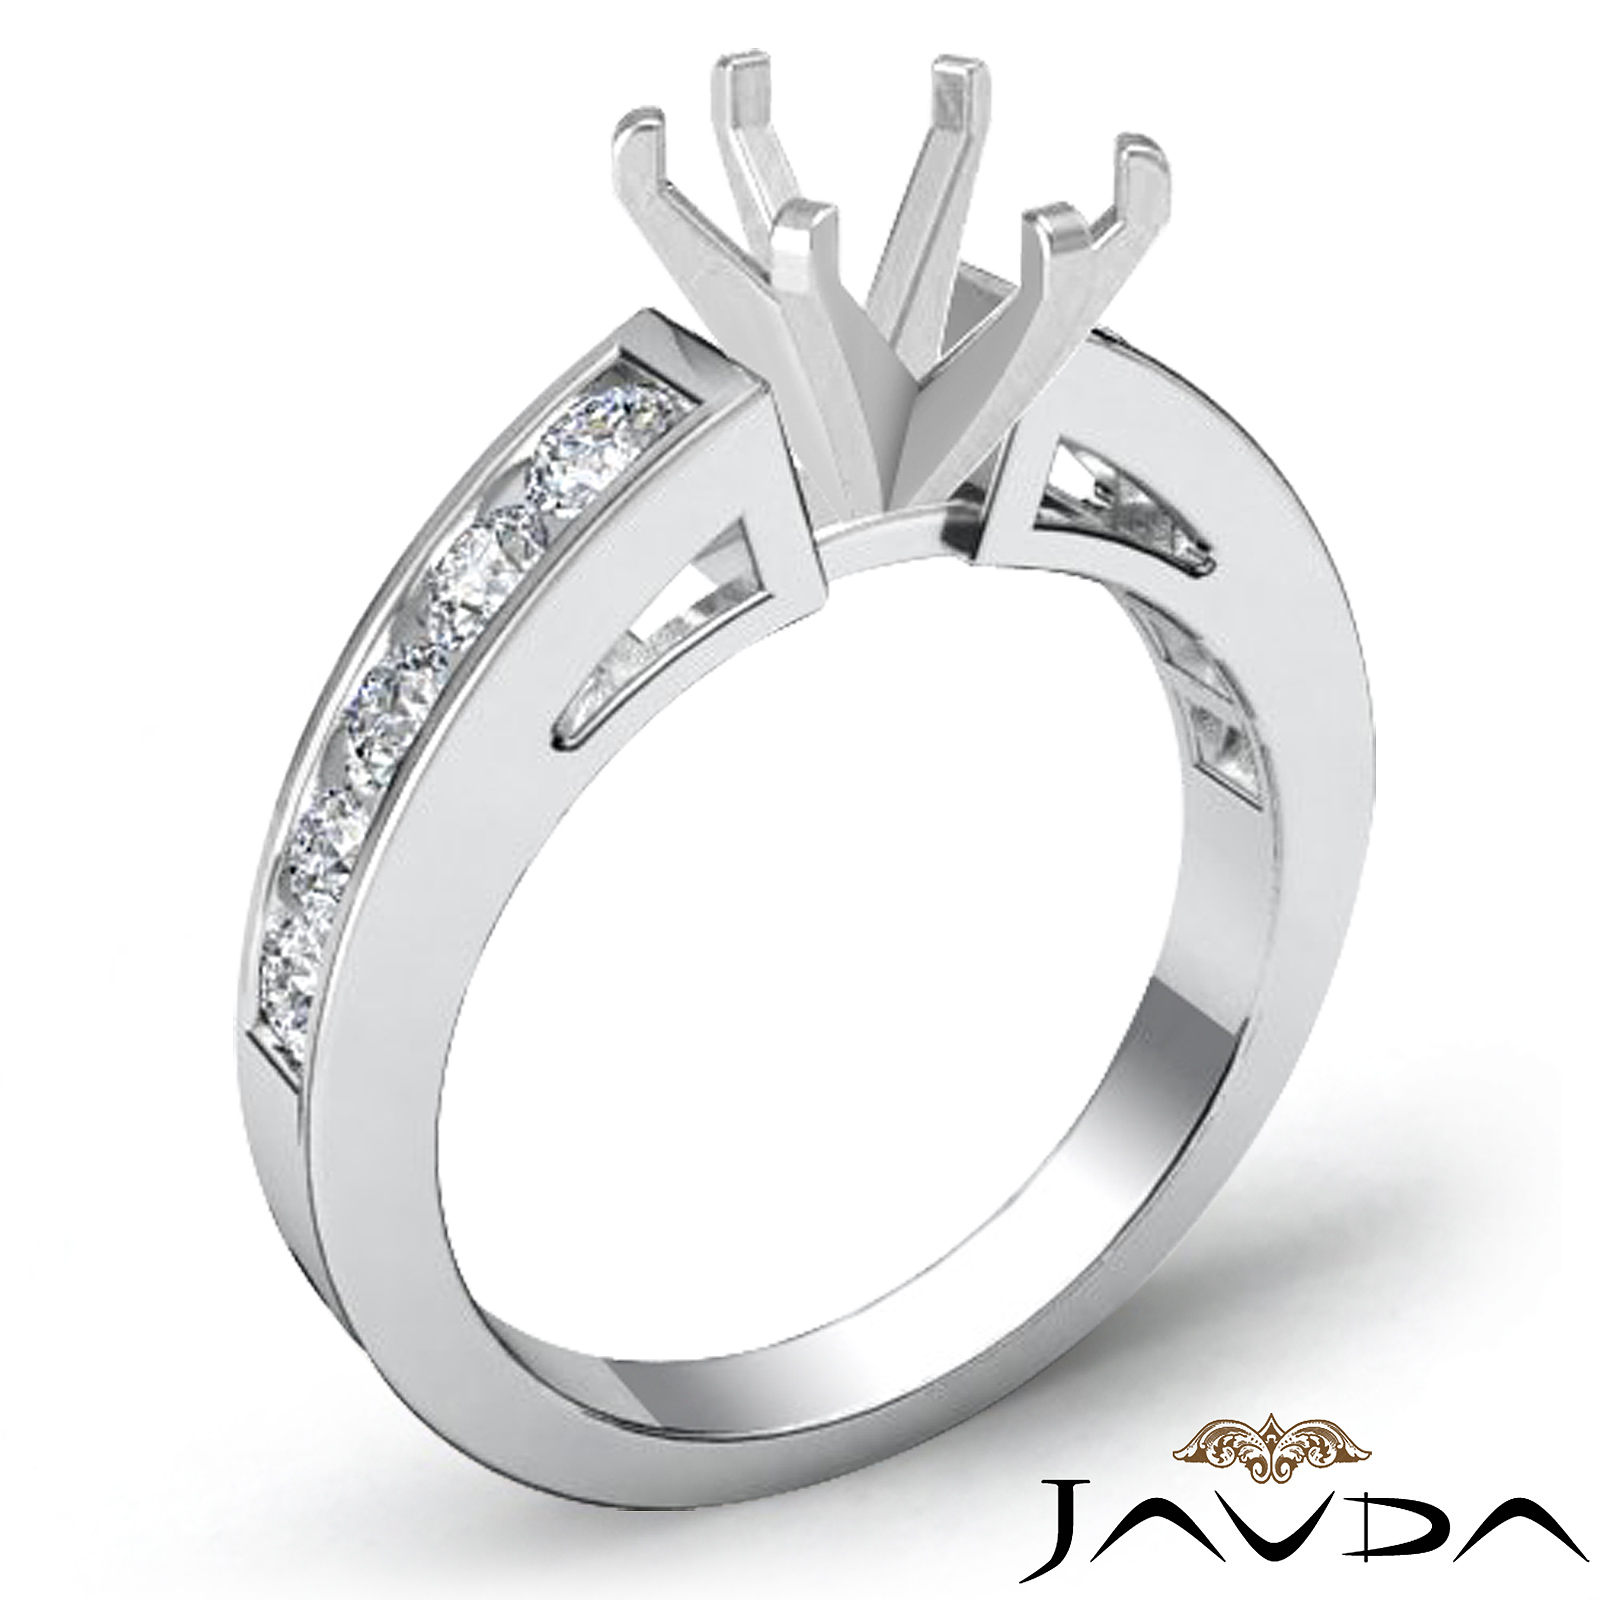 channel set diamond engagement ring 14k white gold oval. Black Bedroom Furniture Sets. Home Design Ideas